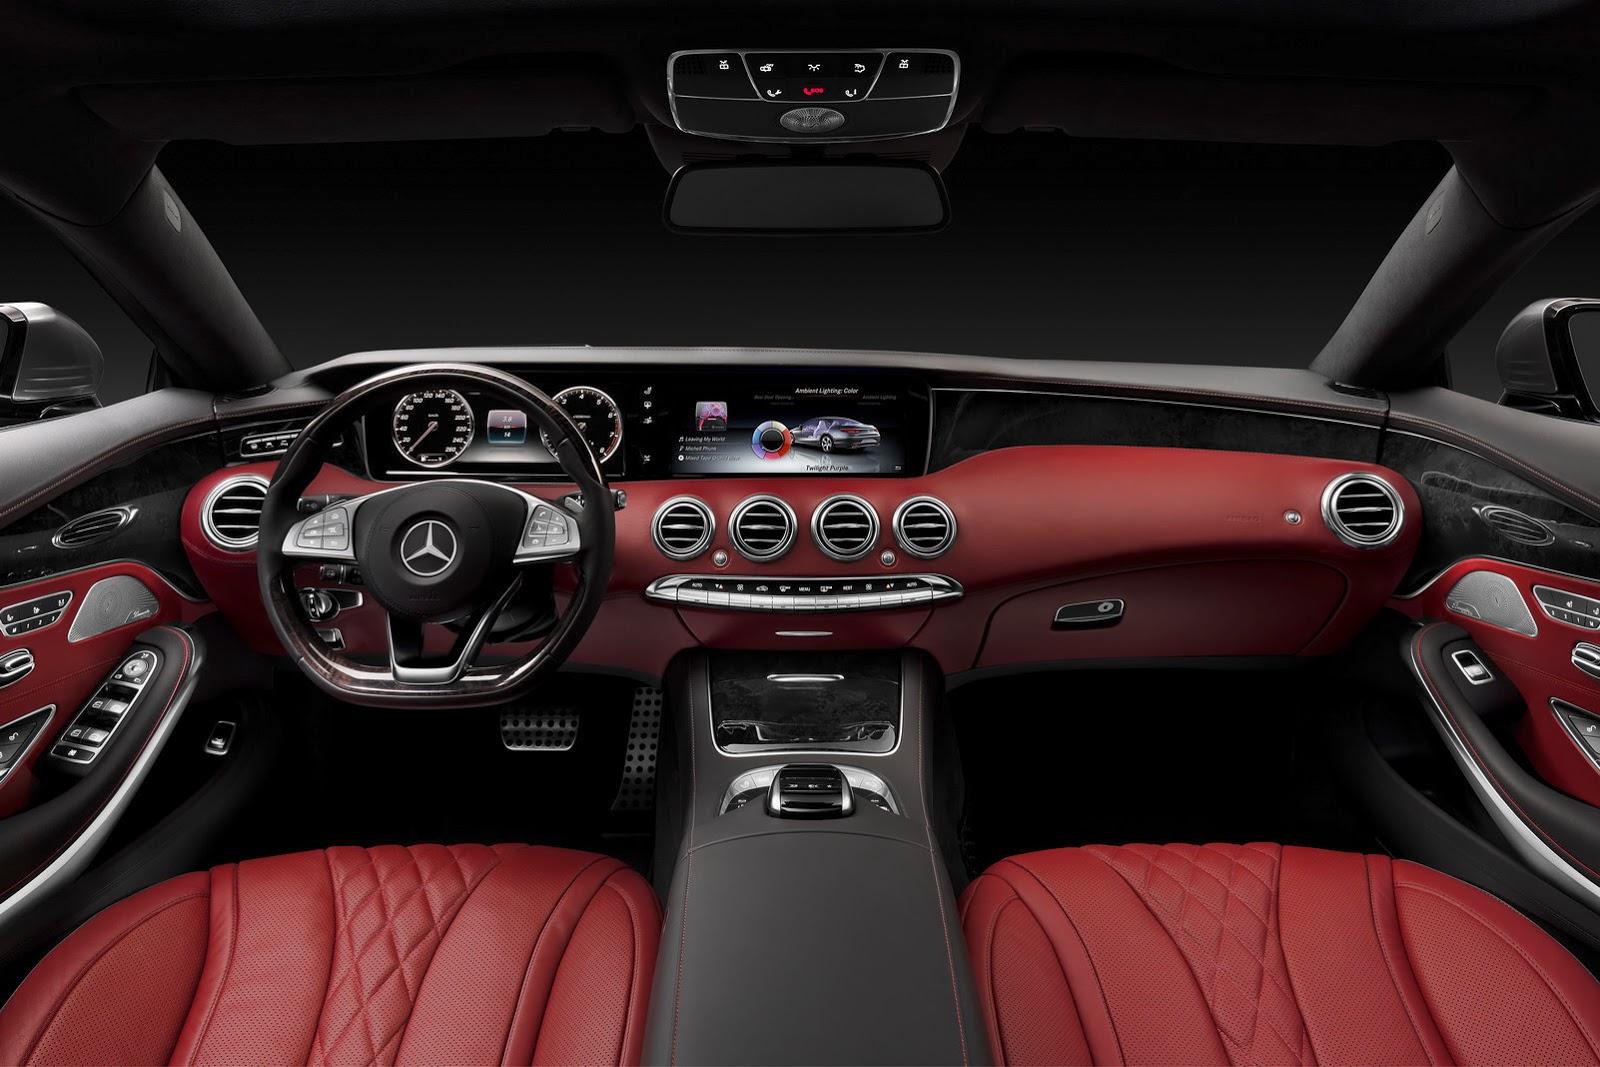 Mercedes-Benz S-class Coupe interior